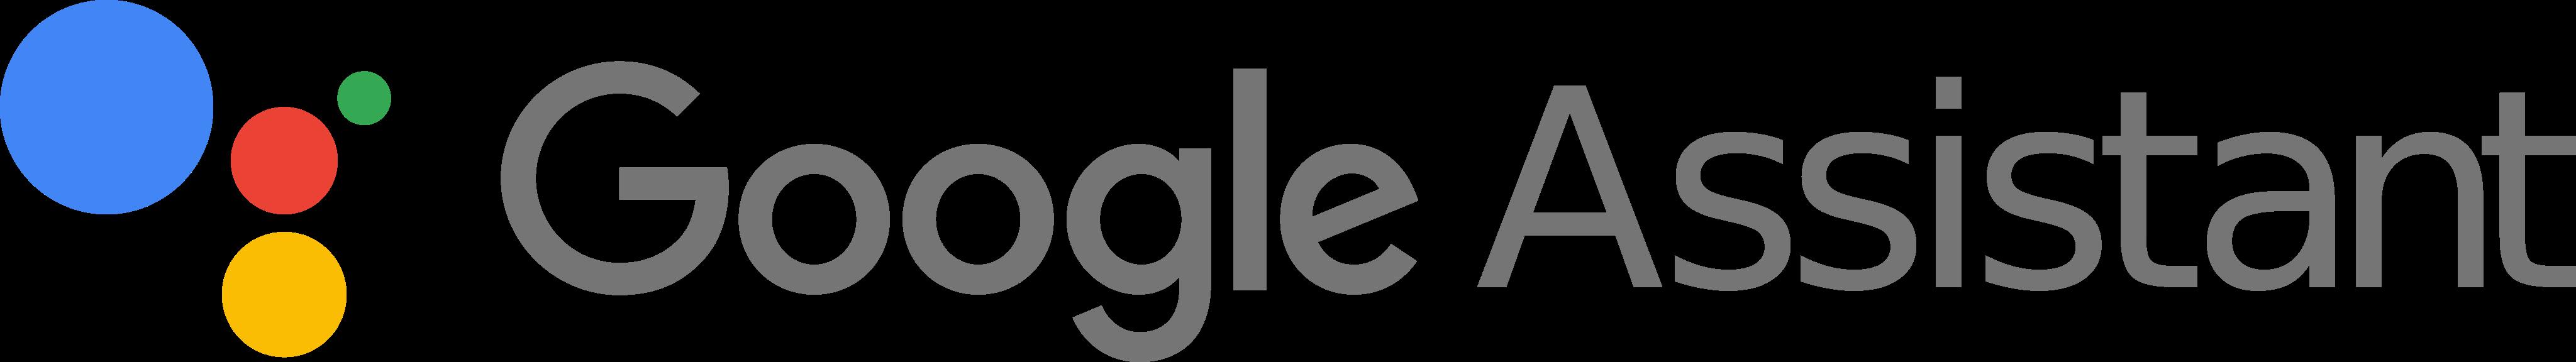 google assistant logo - Google Assistant Logo